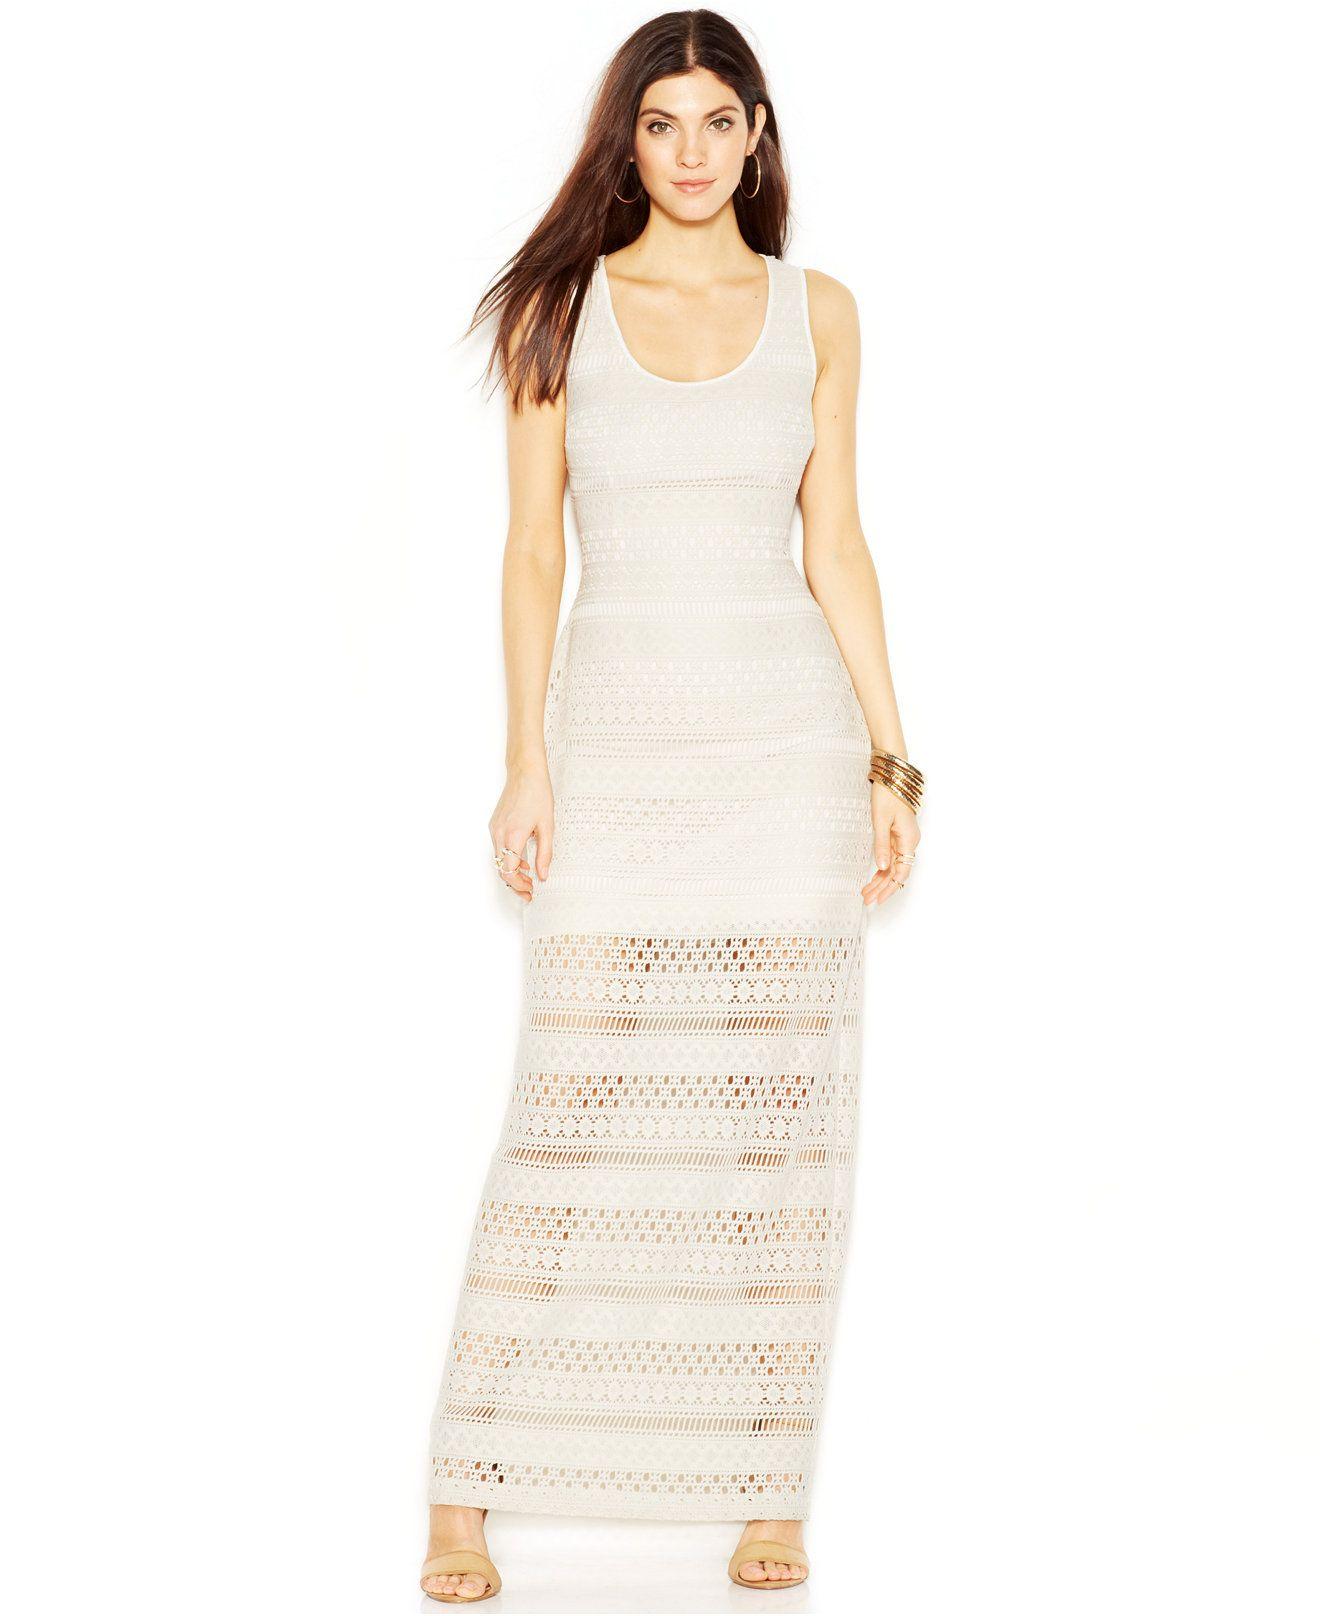 48615f519e73 GUESS Sheer-Panel Crochet Maxi Dress - Maxi Dresses - Women - Macy's ...